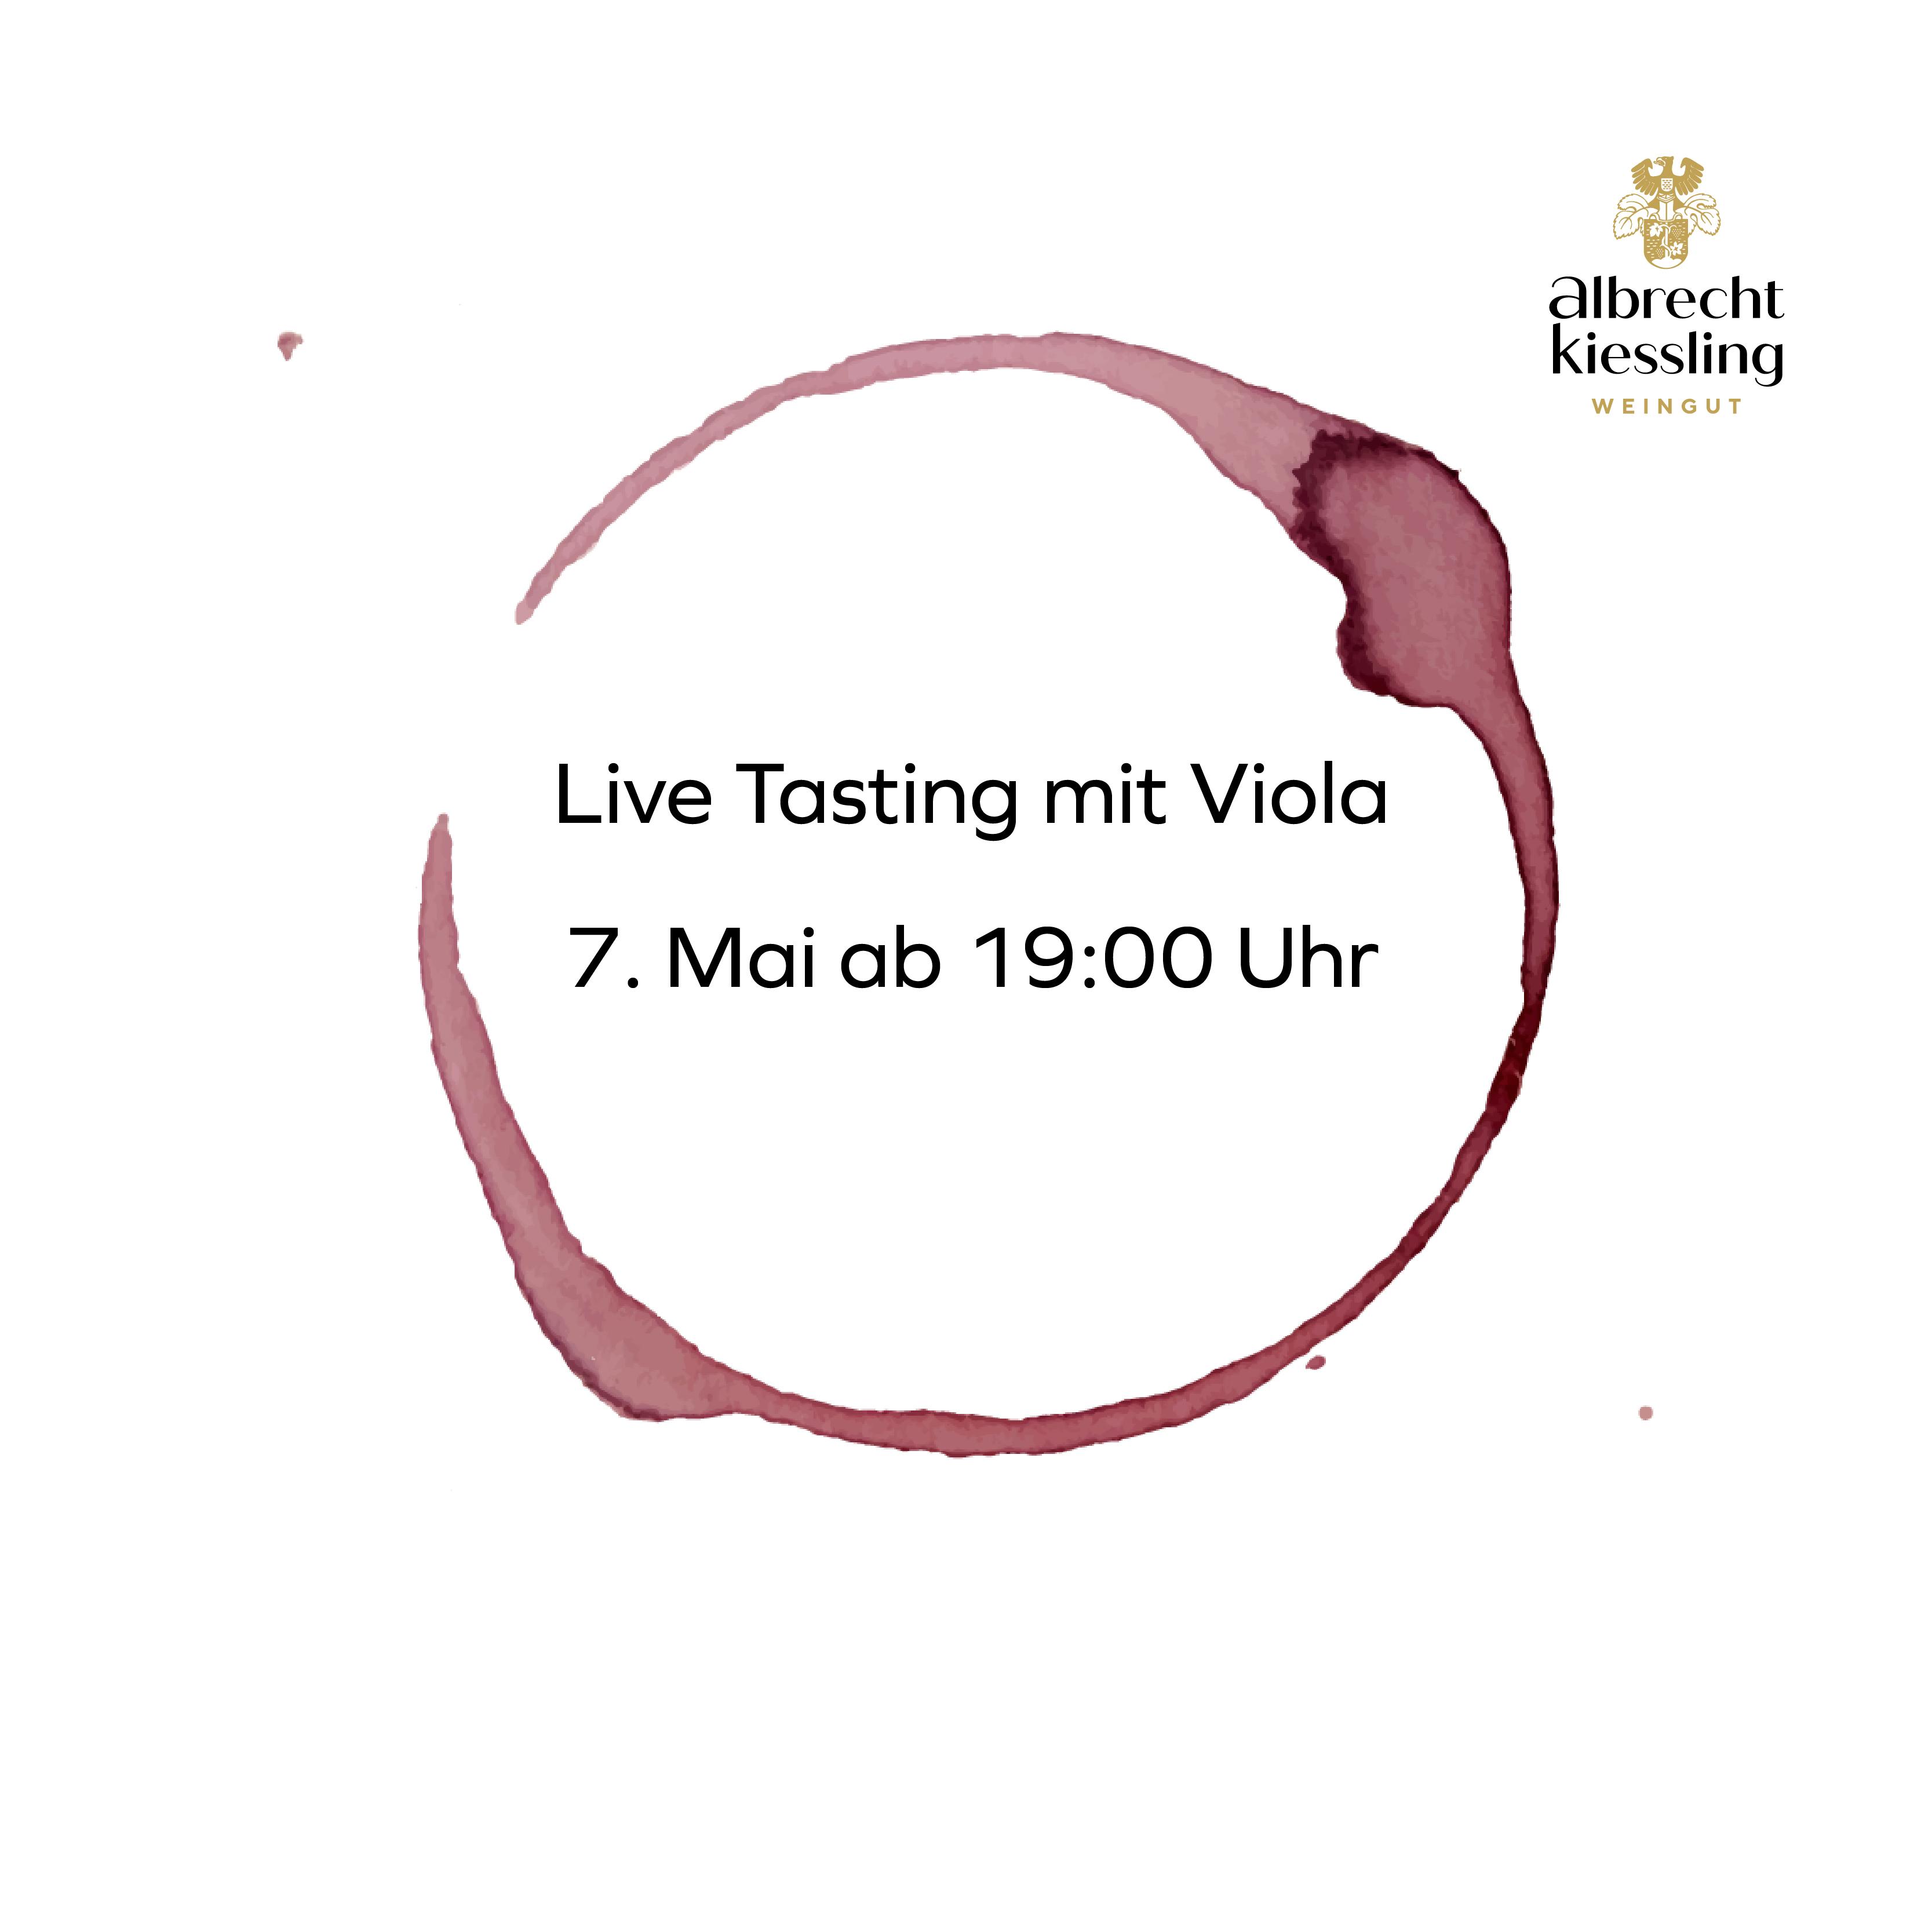 Live-Tasting mit Viola #2